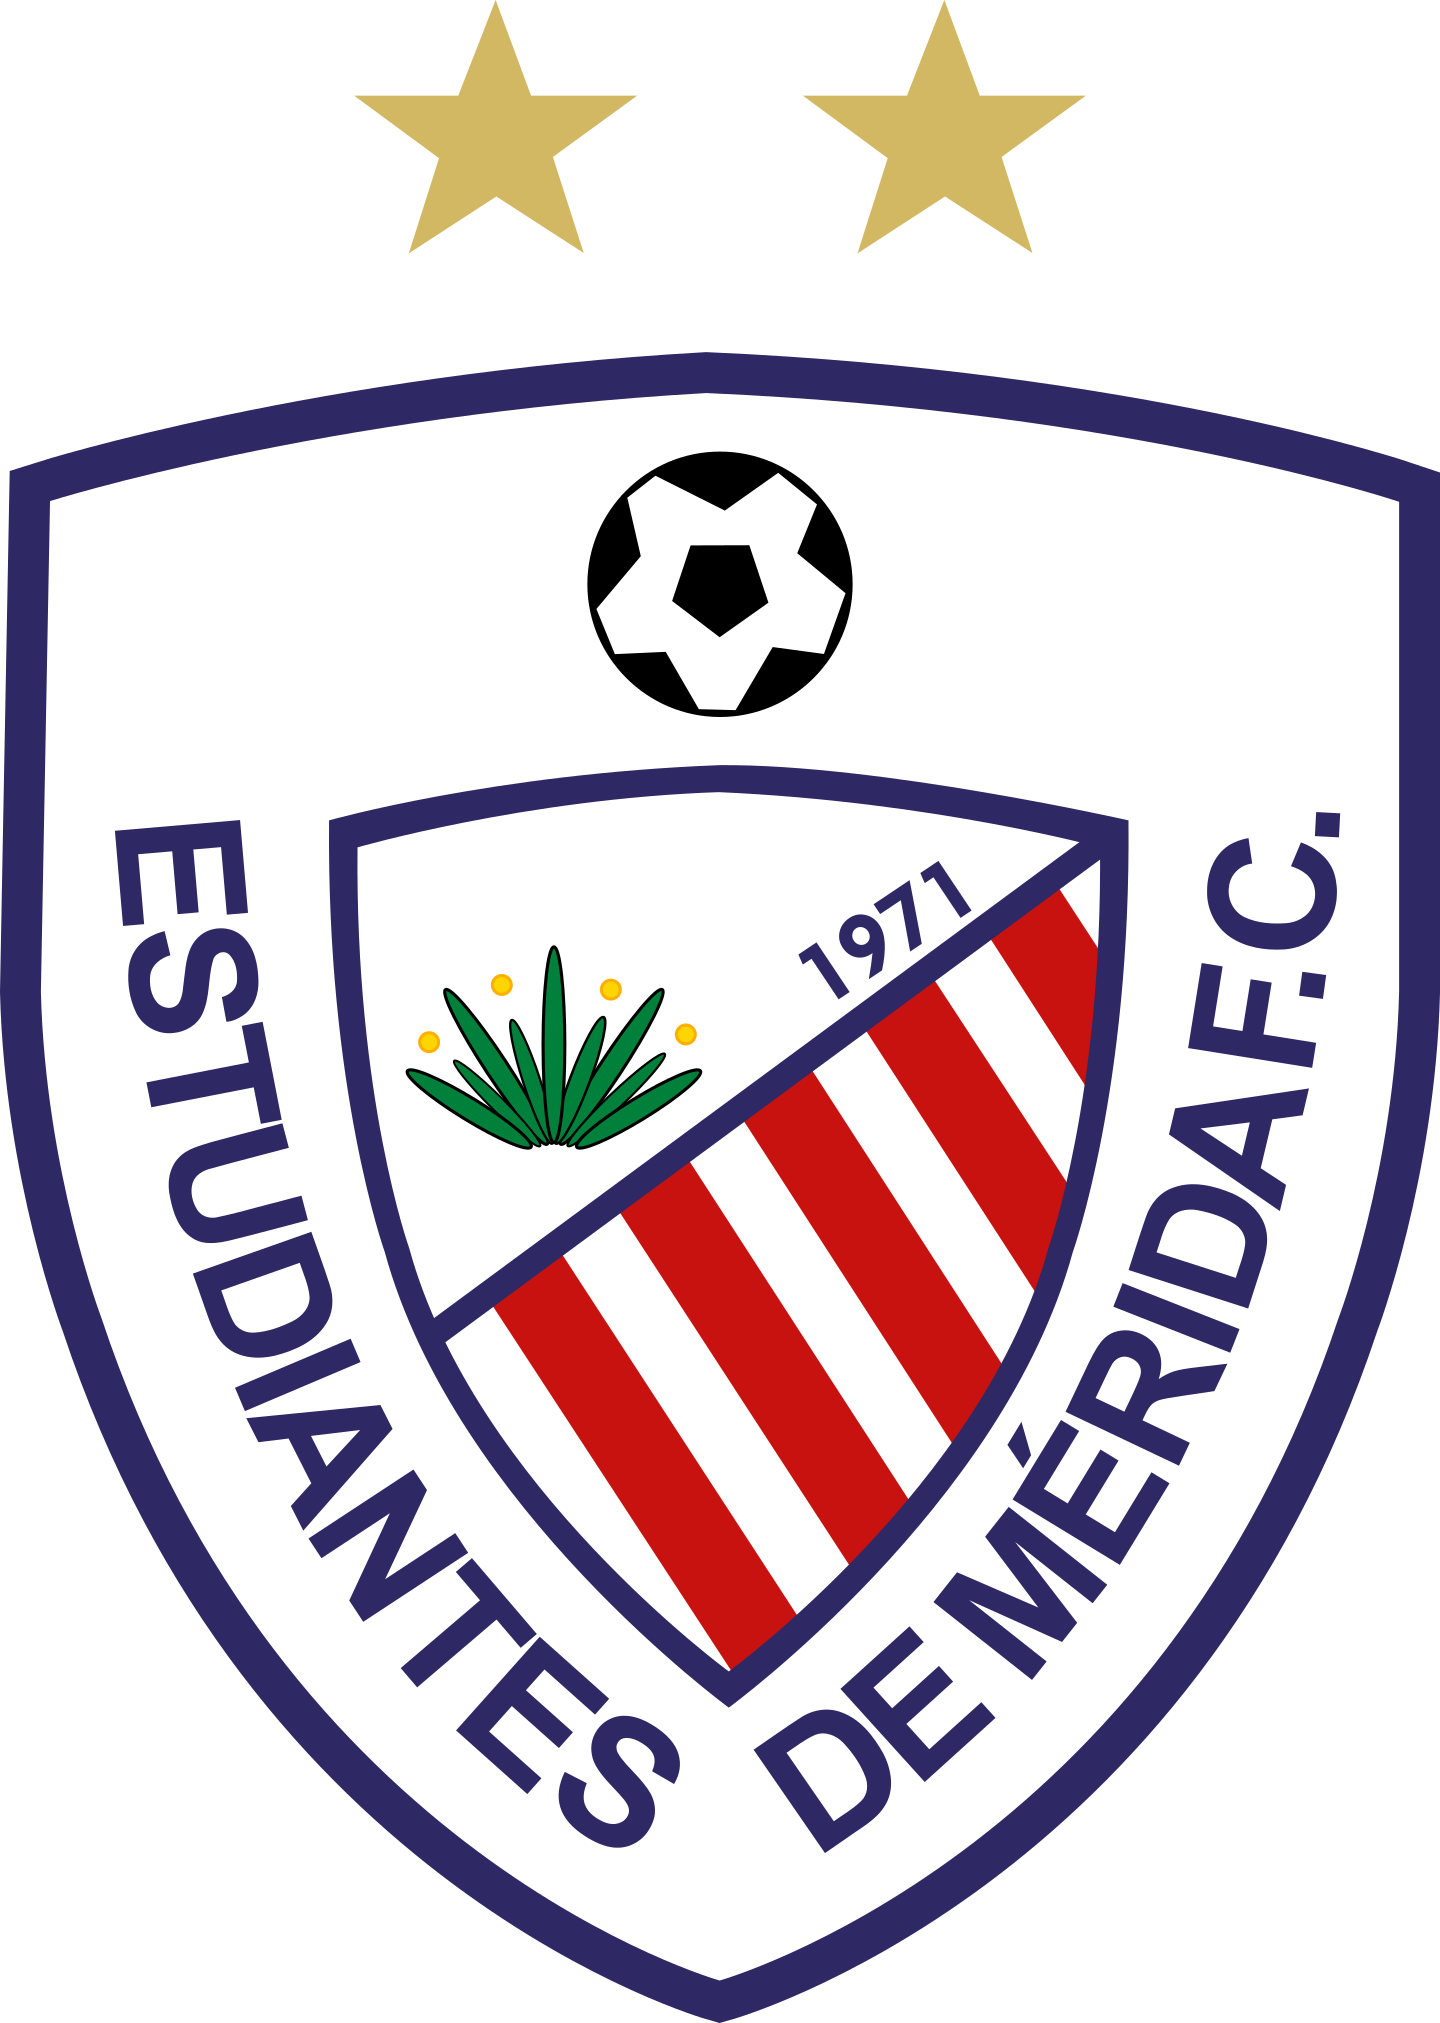 estudiantes de merida logo 3 - Estudiantes de Mérida Logo